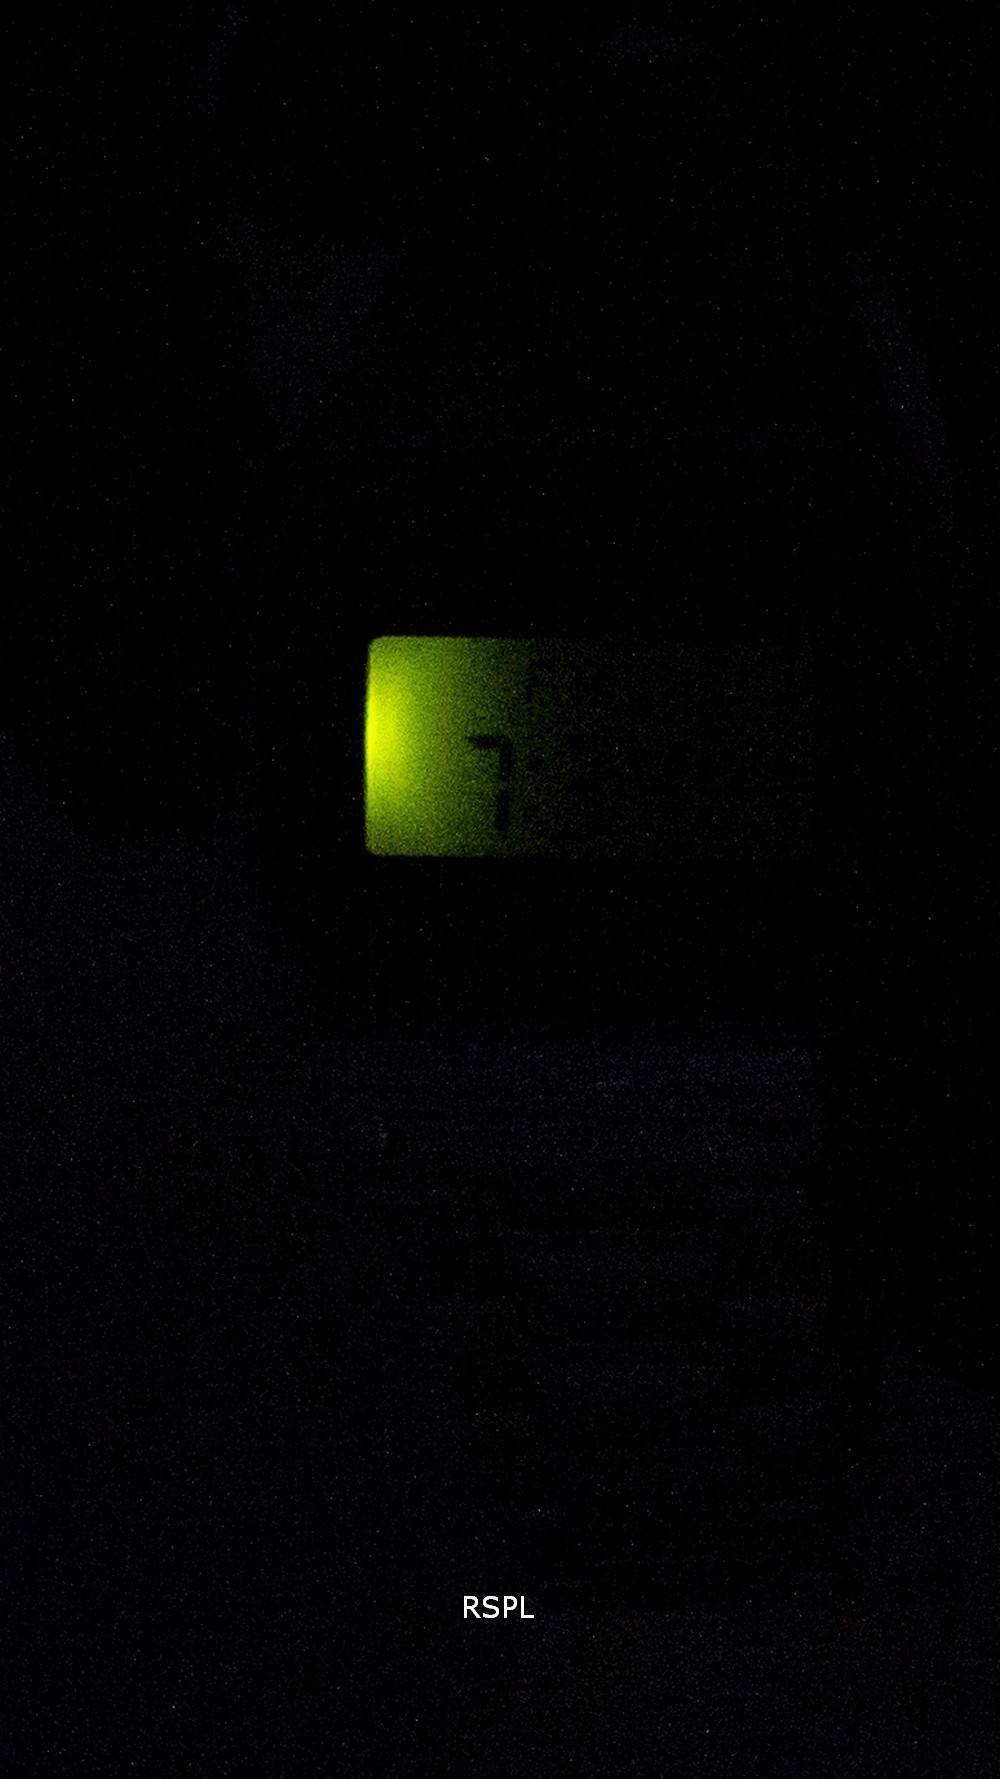 Casio Digital inox quotidienne alarme A158WA 1DF A158WA 1  LcxyE